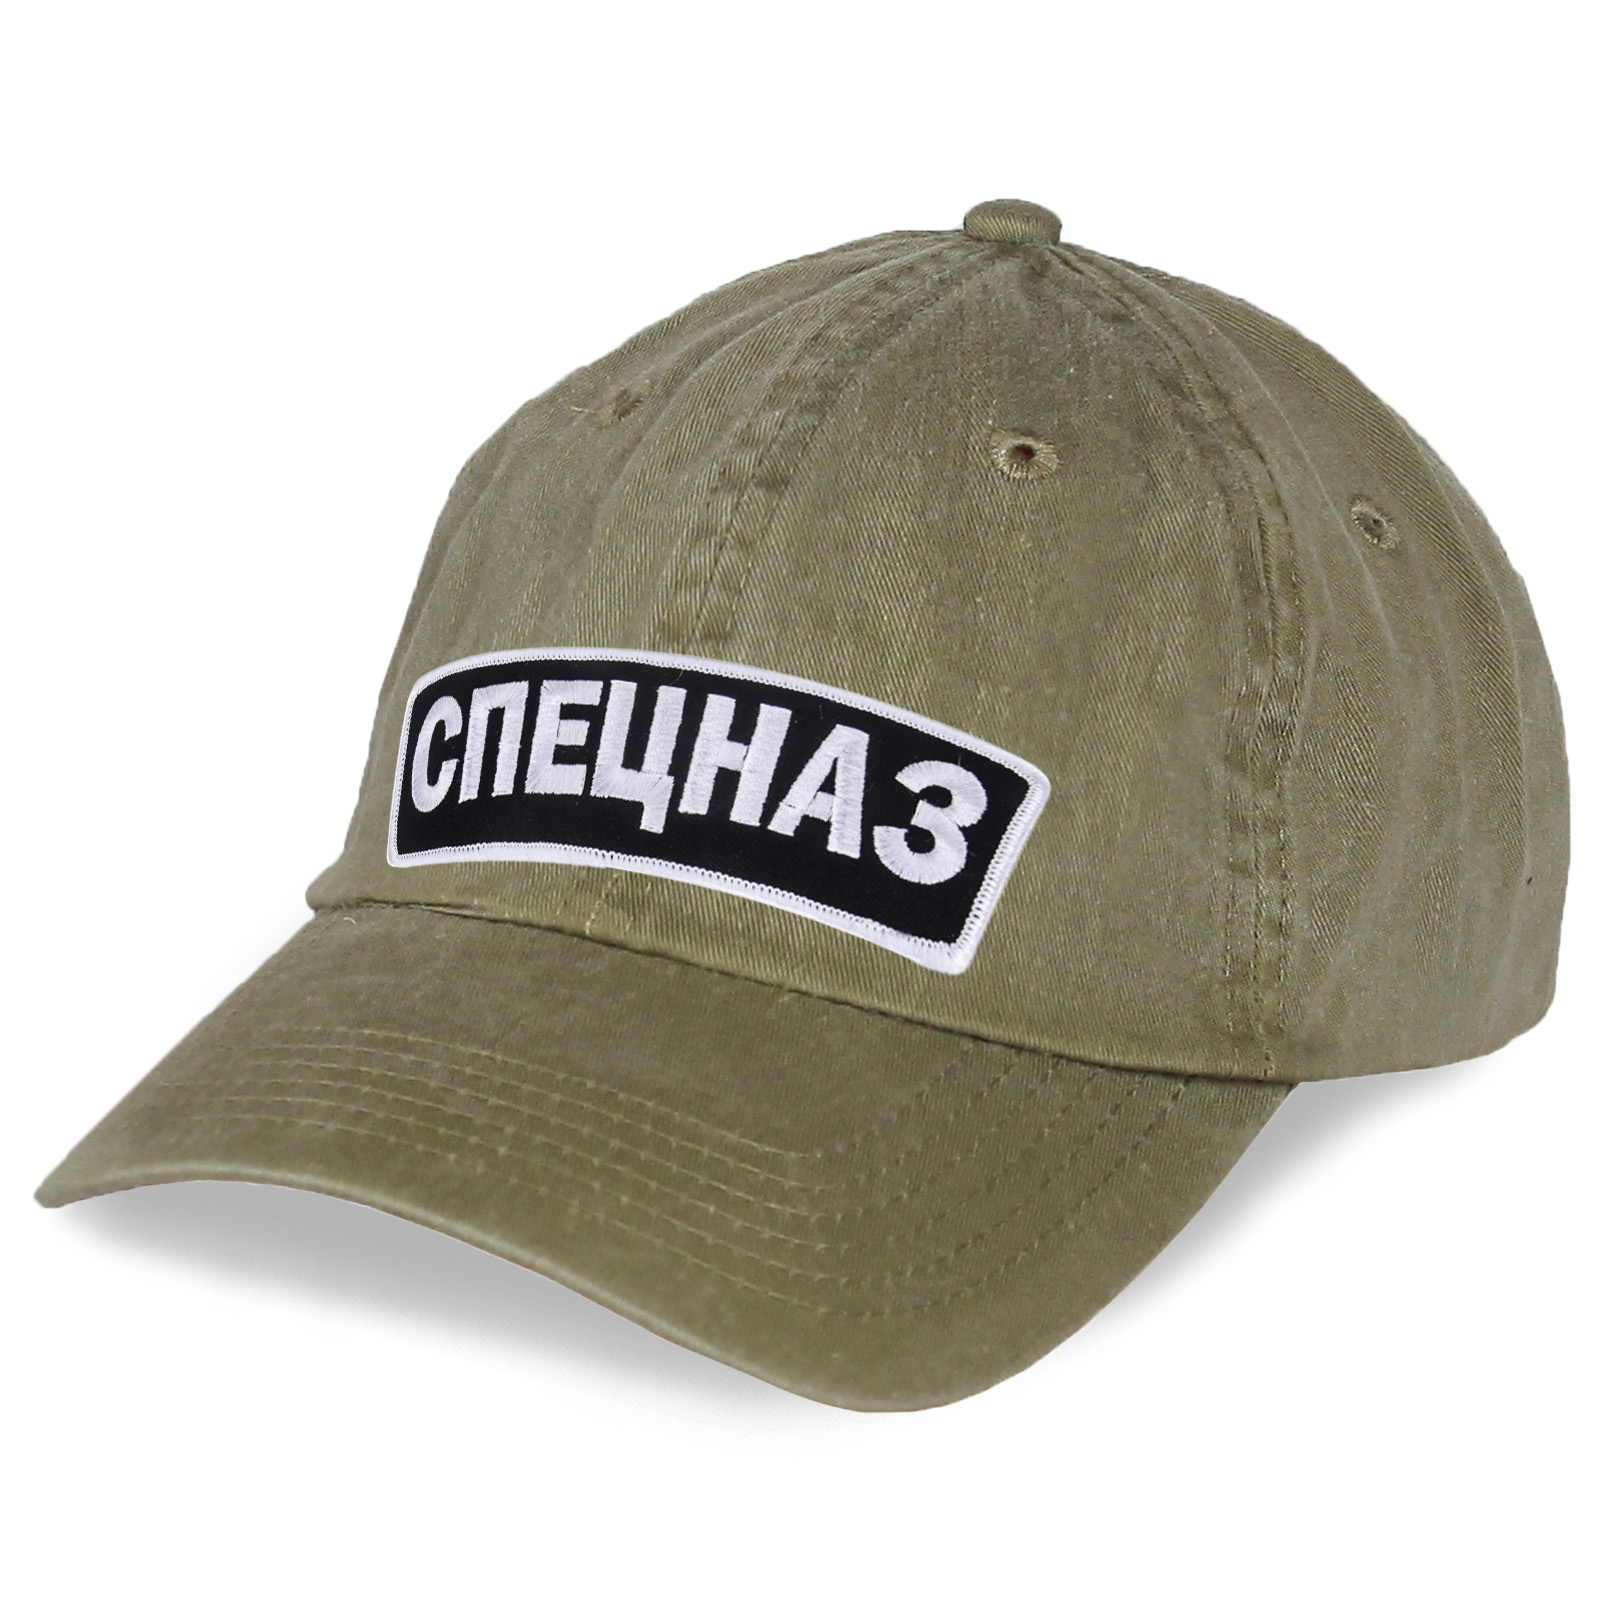 Самая популярная кепка Спецназ с вышивкой